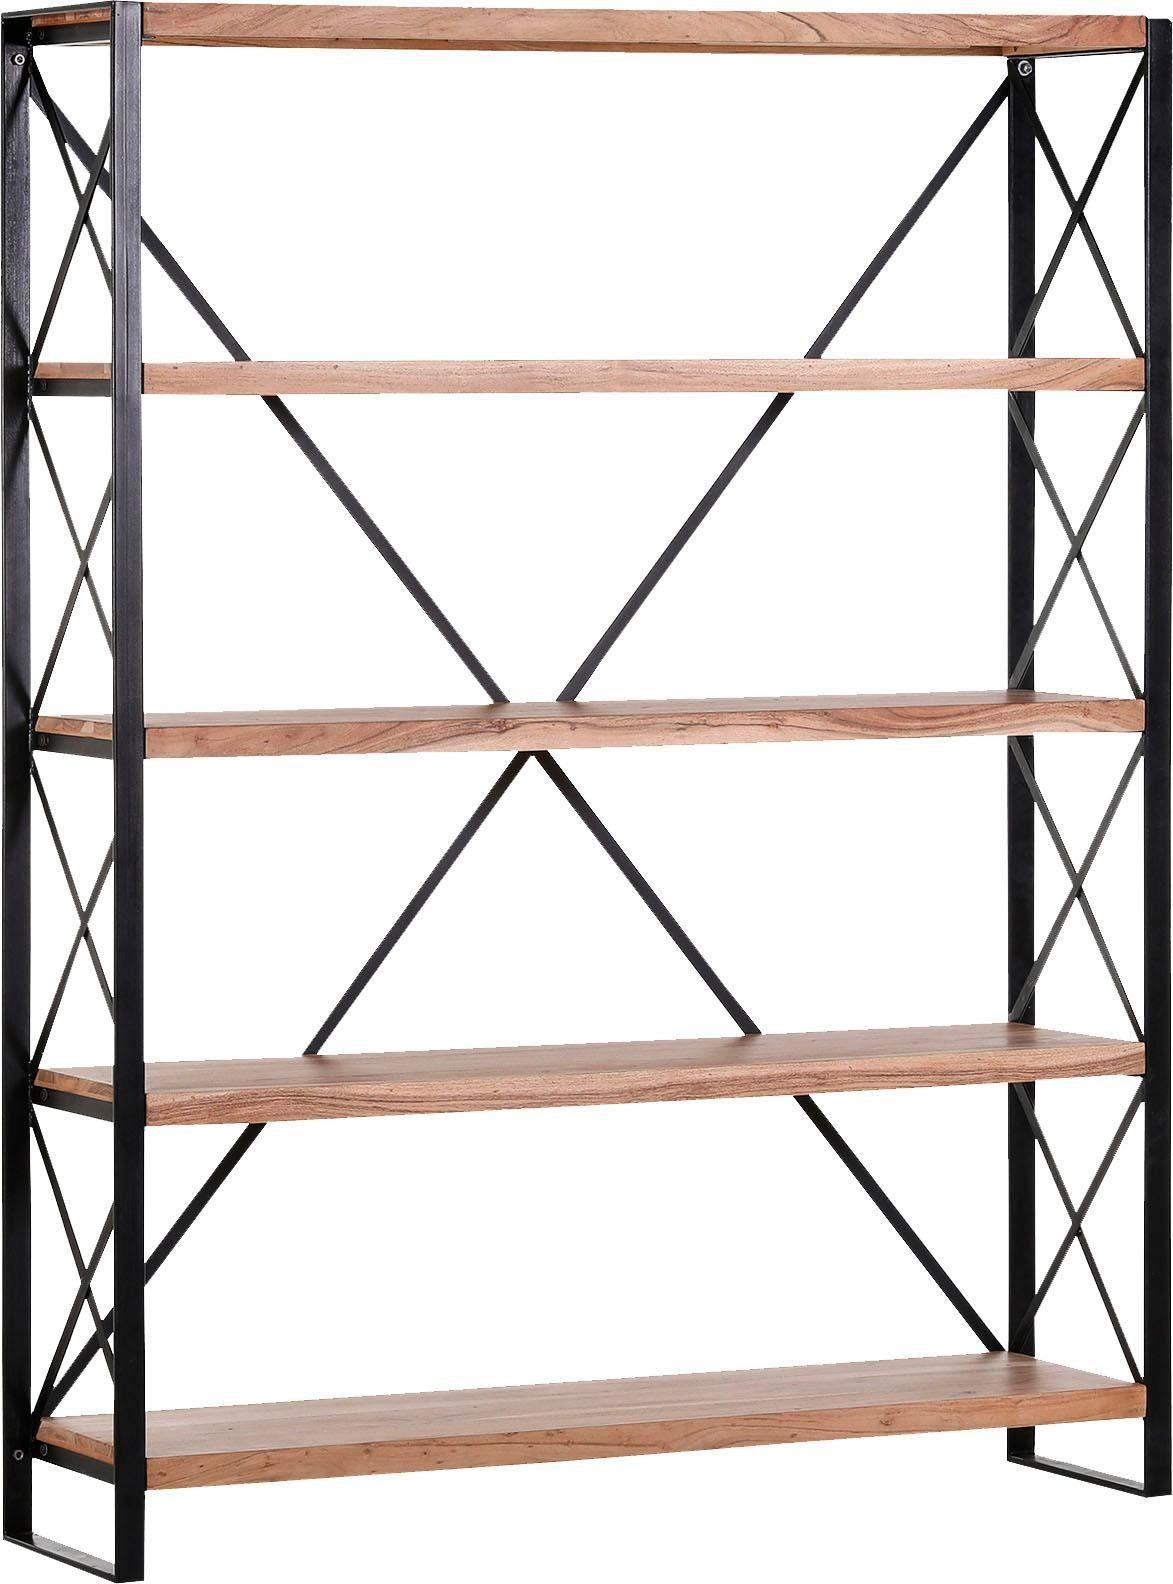 Gutmann Factory Raumteiler »Downtown«, aus massivem Akazienholz mit Diagonalverstrebungen, Höhe 190 cm